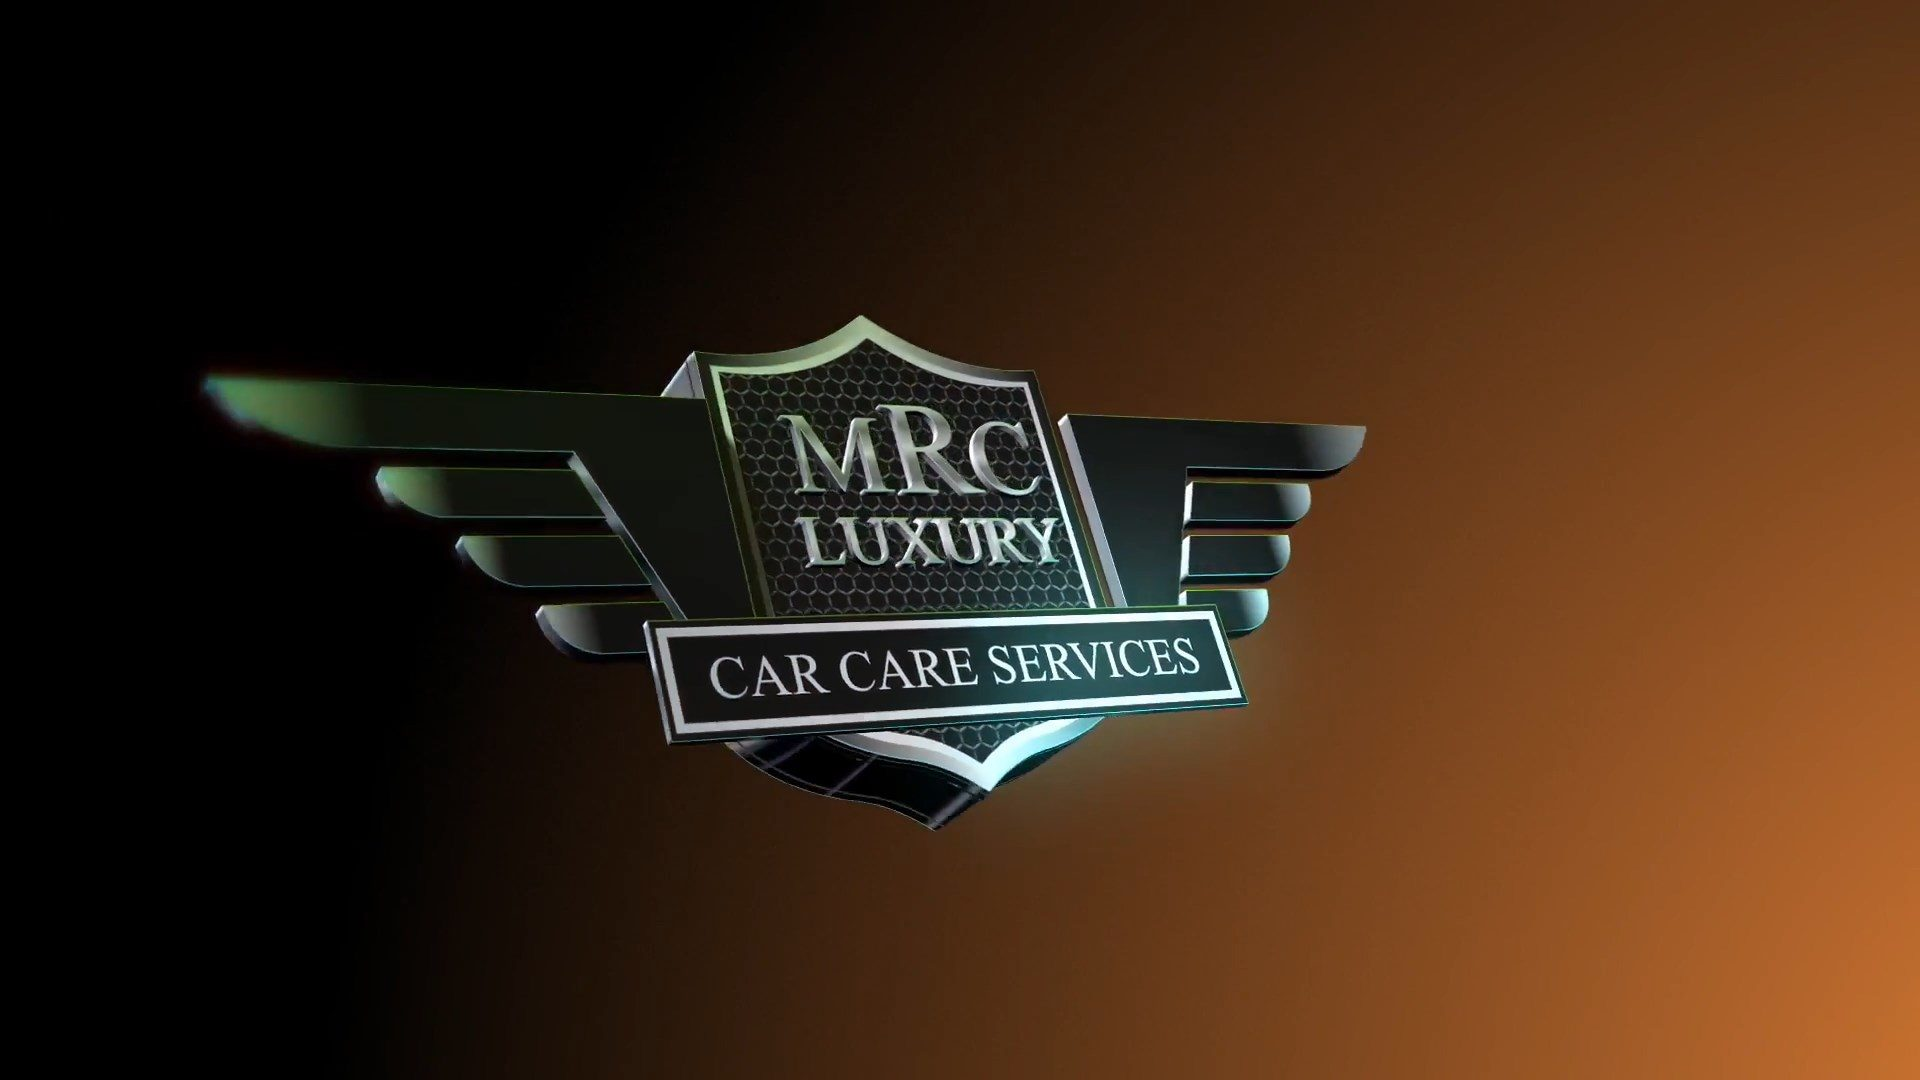 MRC Luxury Tanıtım Filmi.mp4 snapshot 00.02 1920x1080 - MRC Luxury Tanıtım Filmi